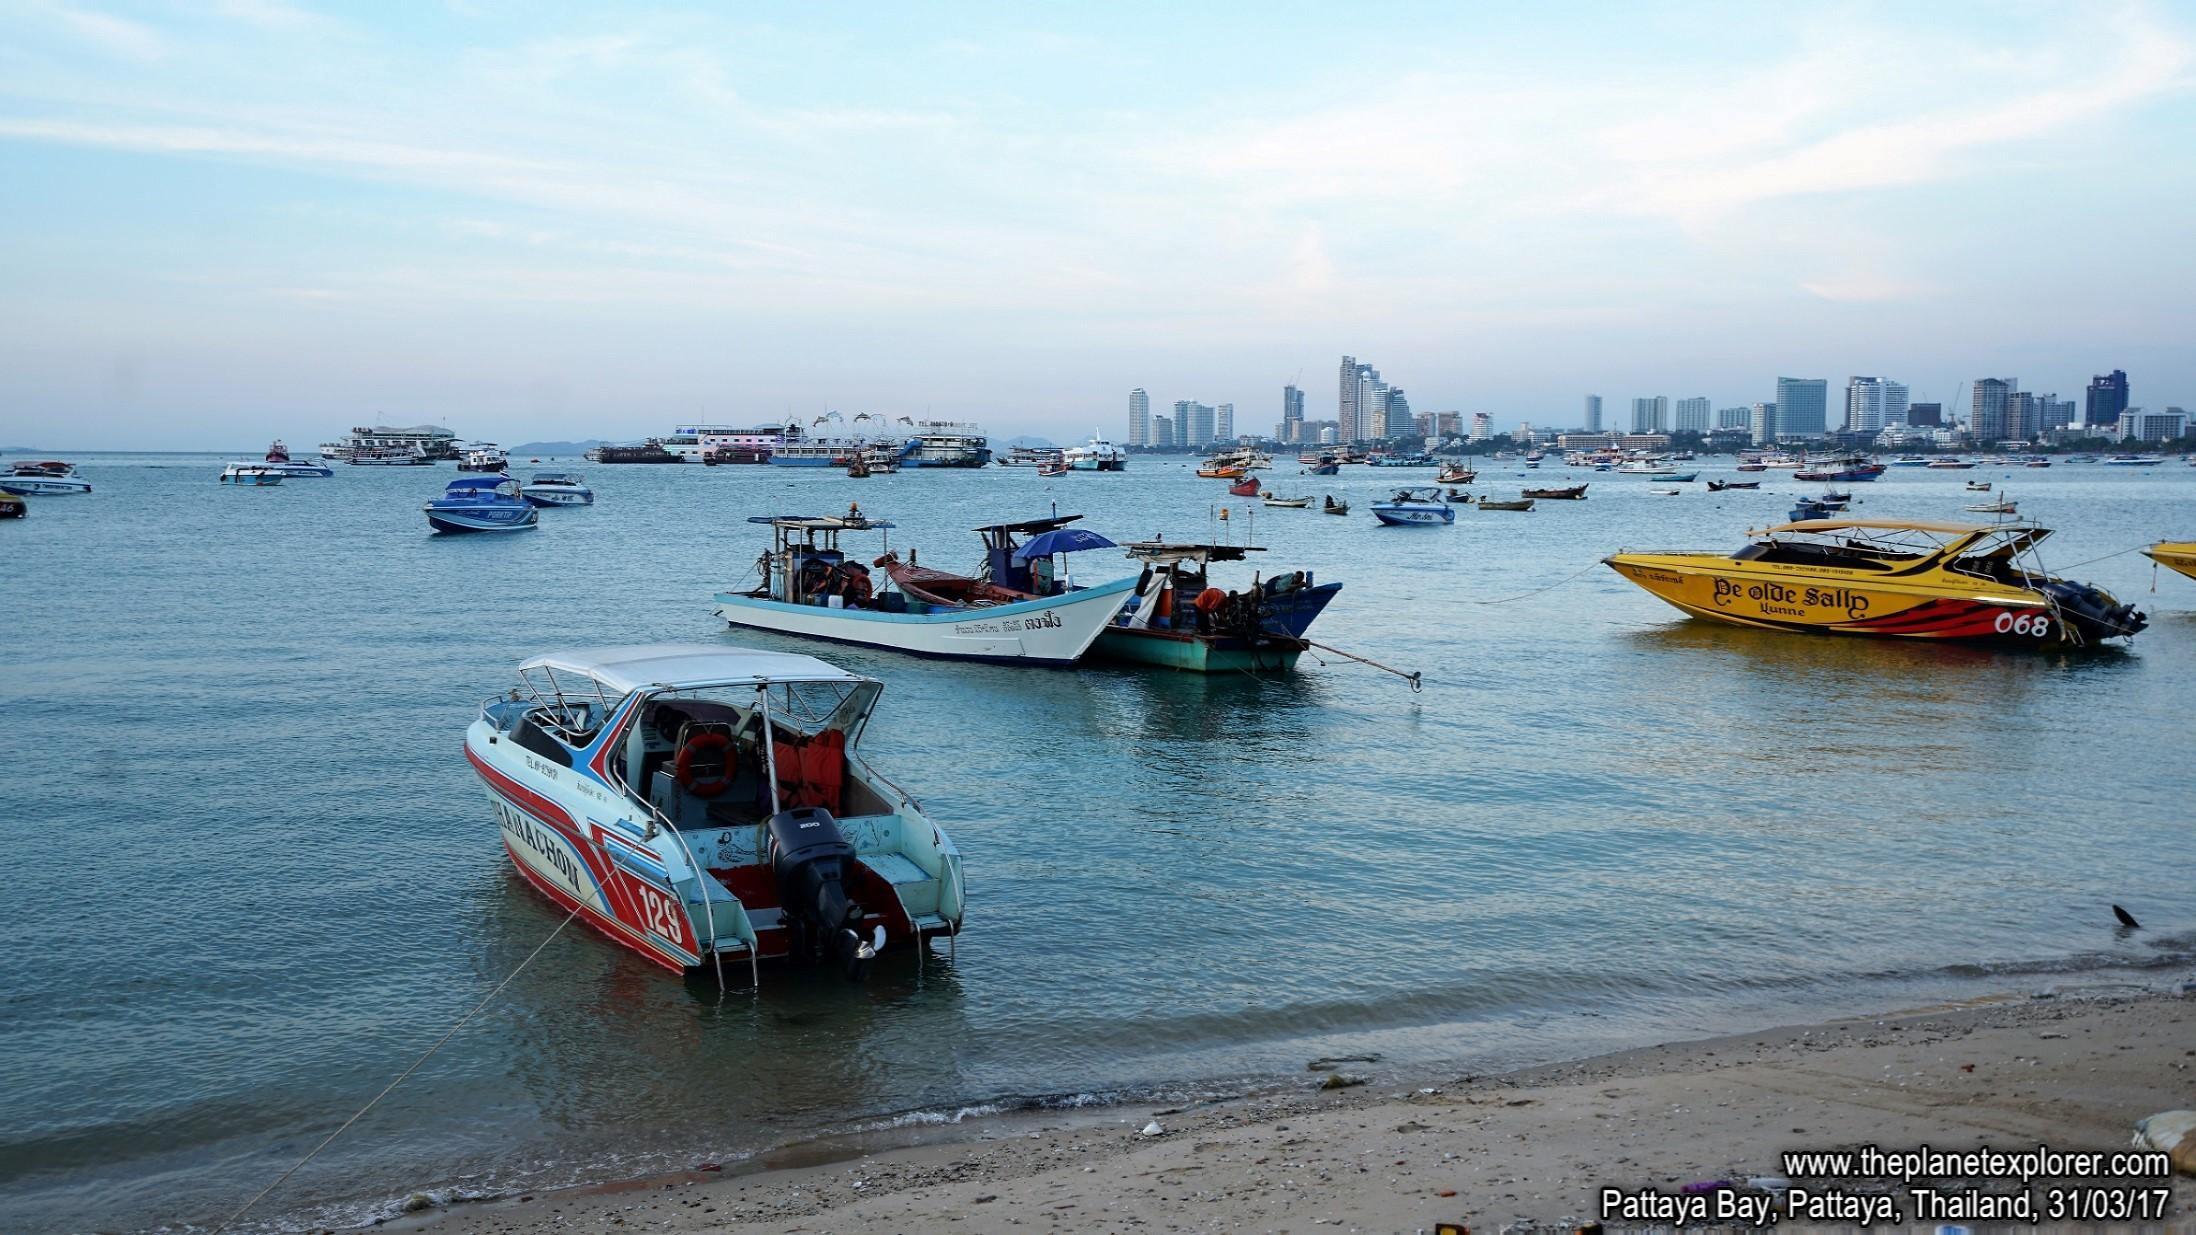 2017-03-31_1807_Thailand_Pattaya_Pattaya Beach_DSC04013_s7R2_LR_@